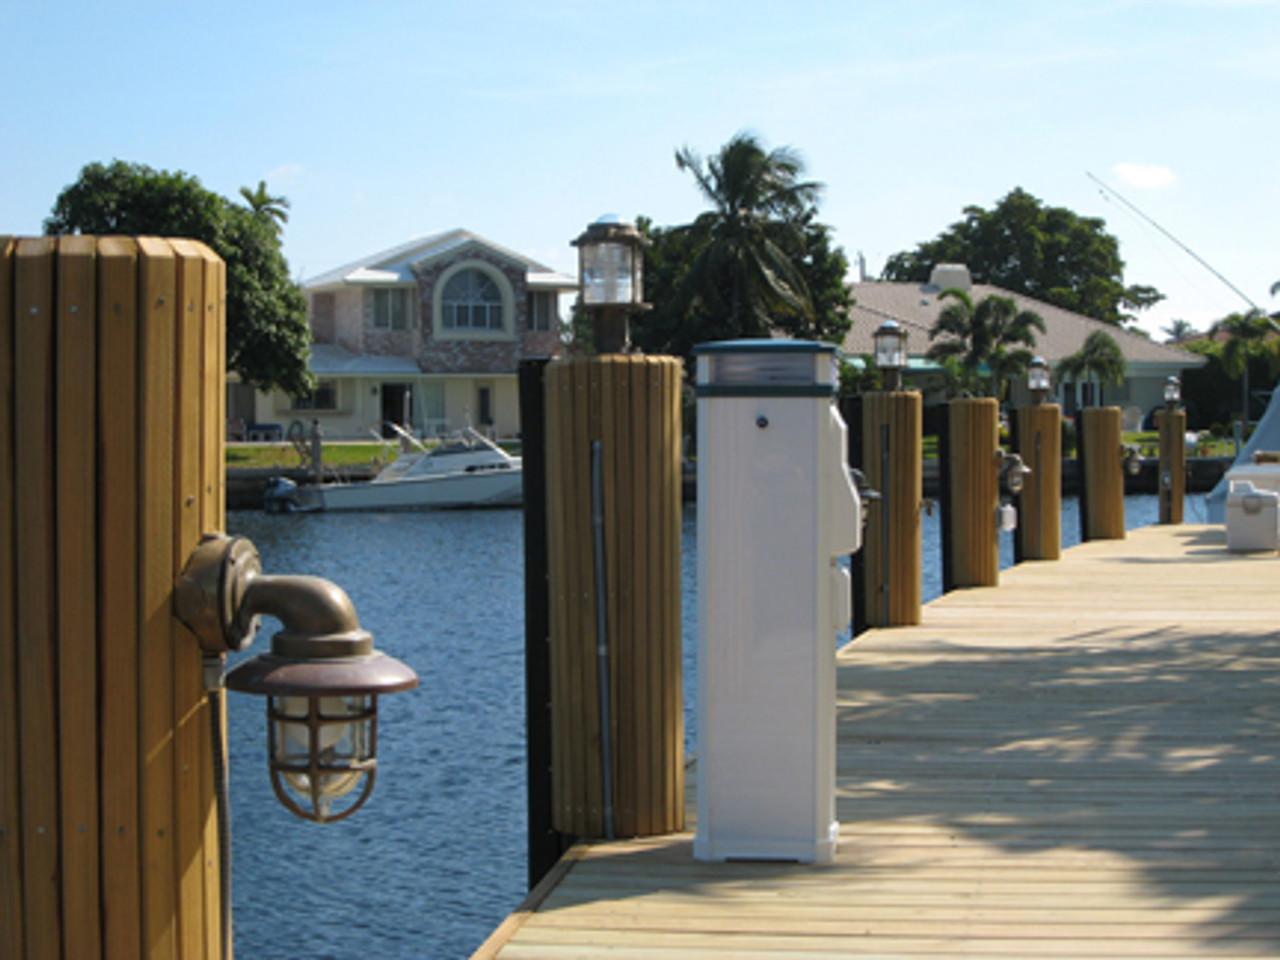 pathway dock lights used to illuminate a dock walkway